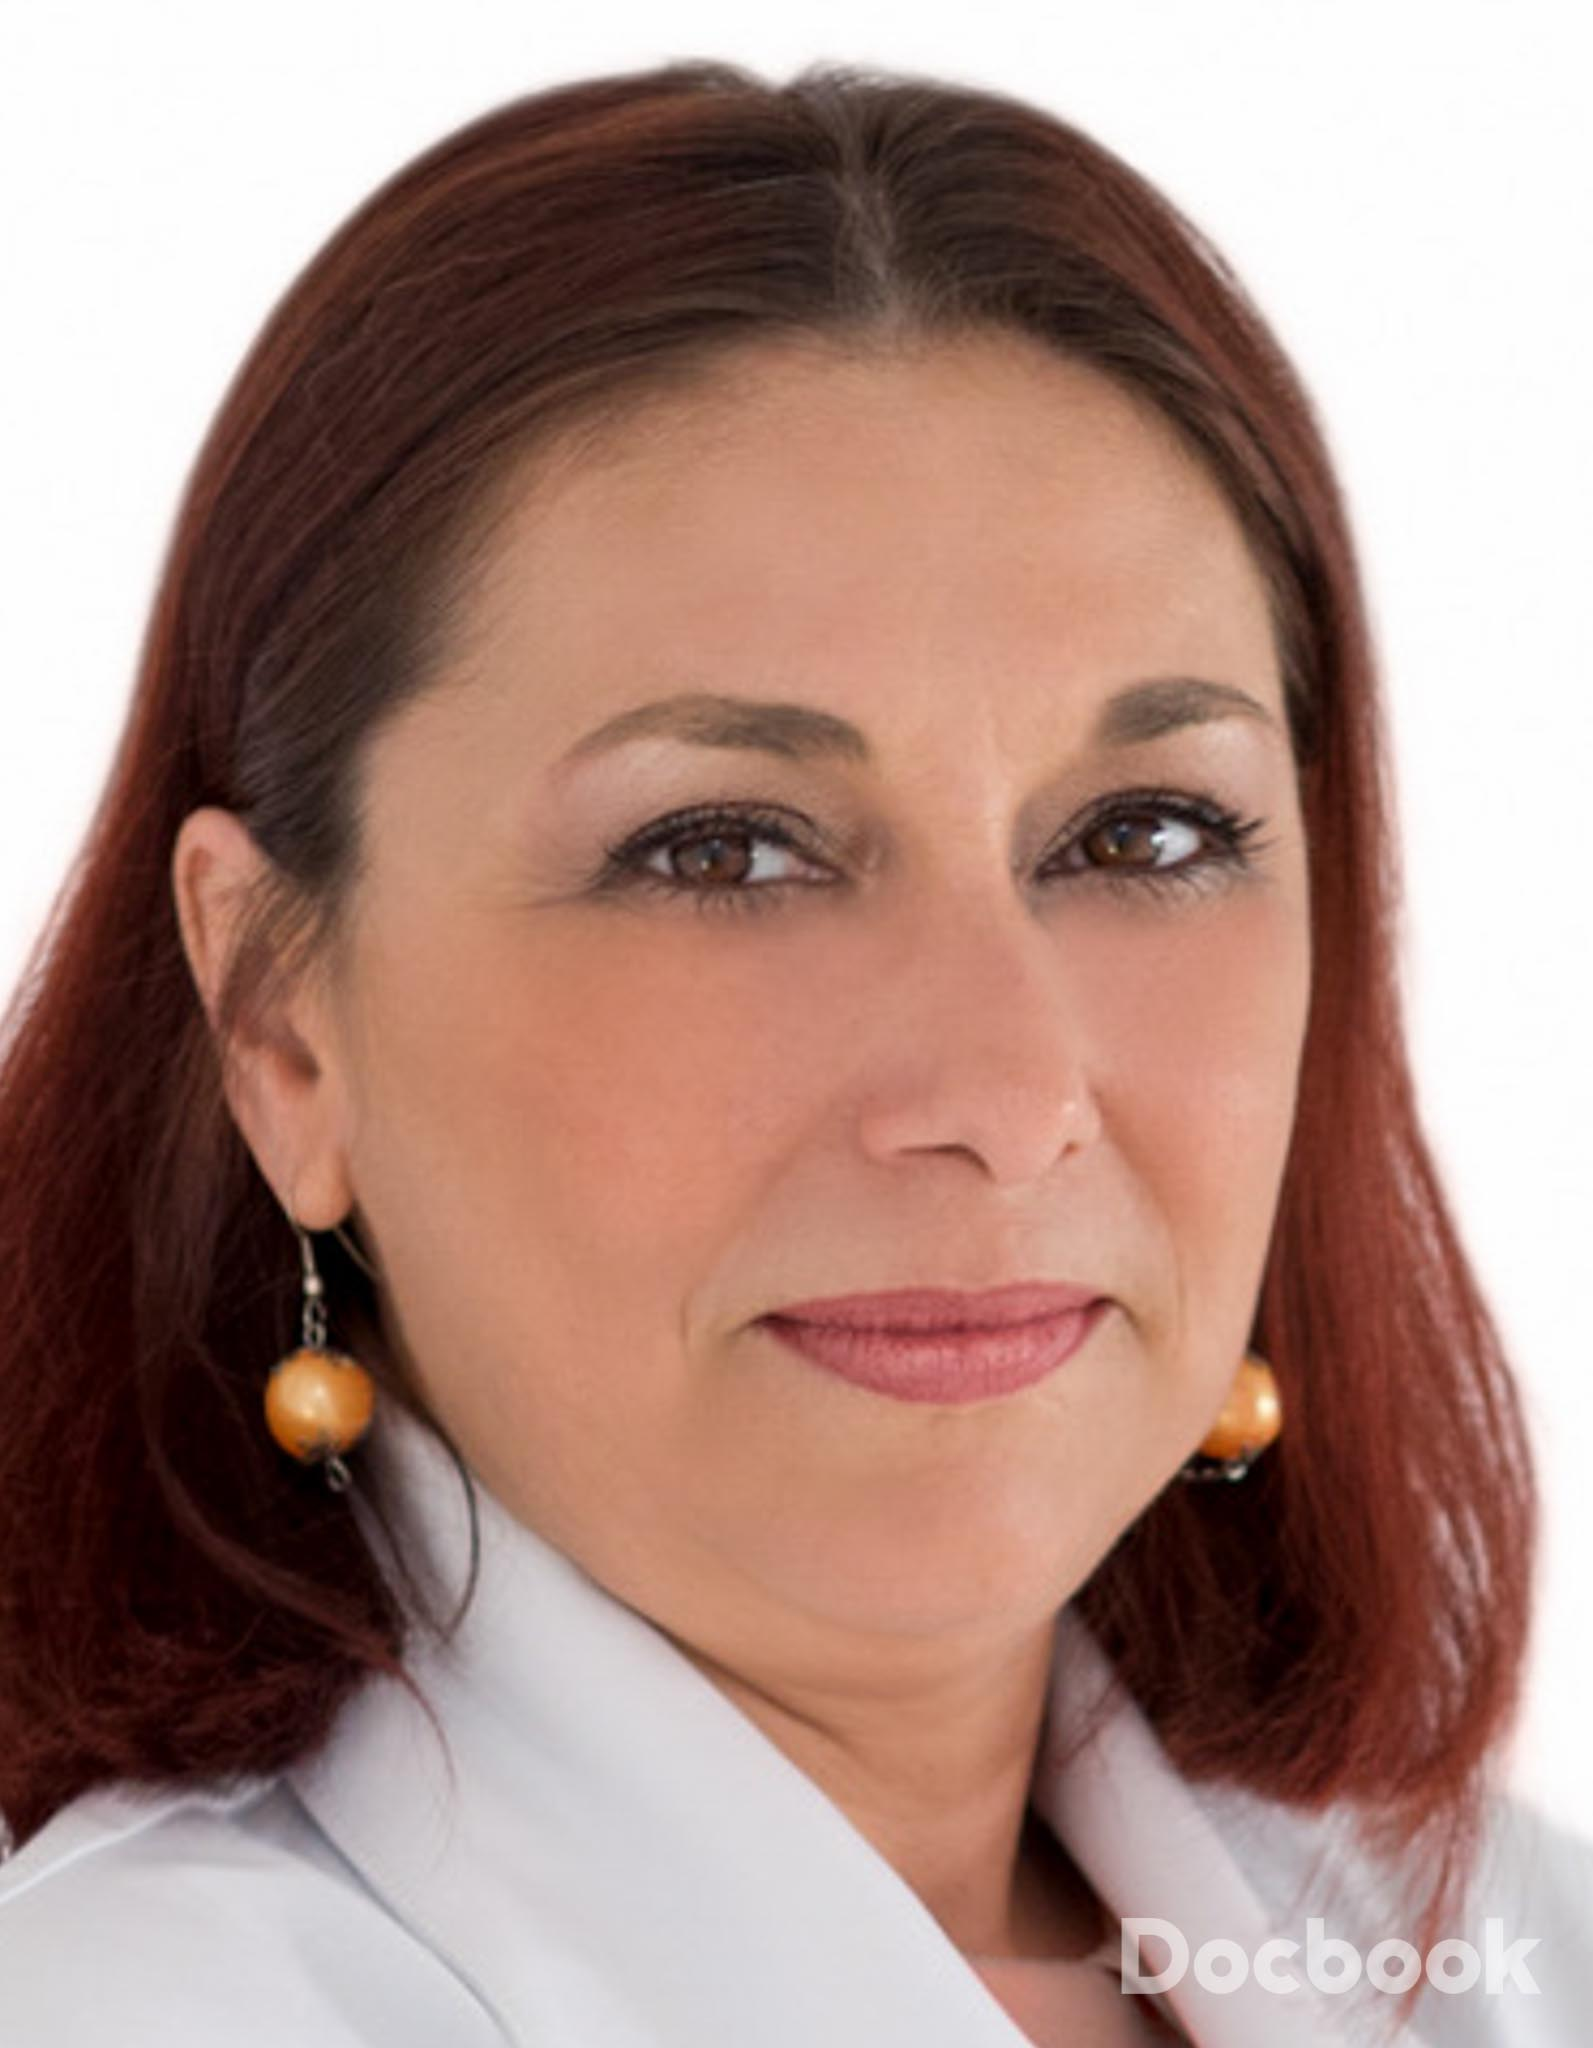 Dr. Marineta Magureanu